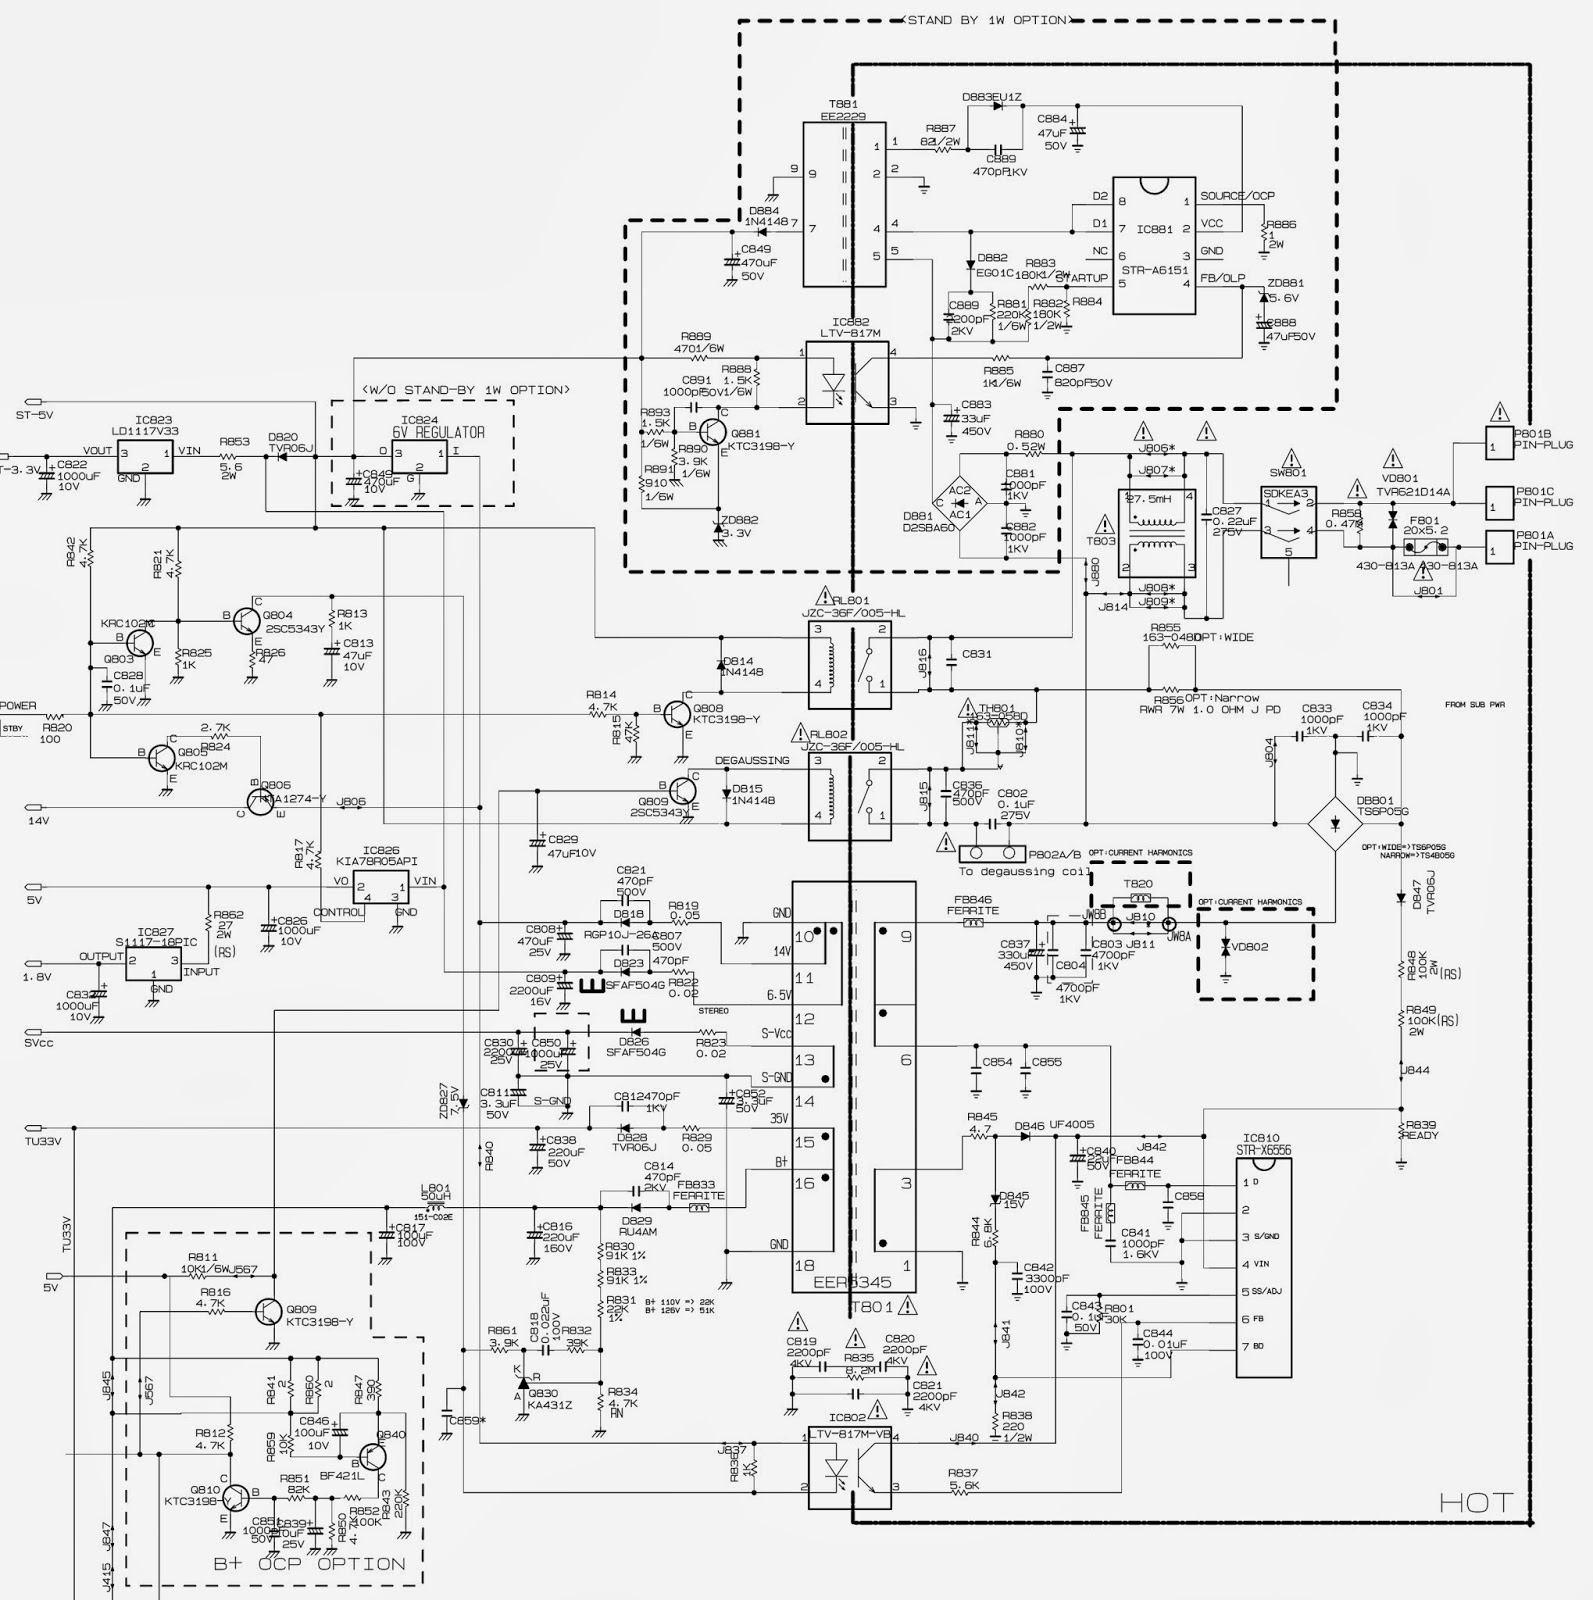 Smps Schematic Diagram 2005 Mitsubishi Triton Radio Wiring Str X 6556 Based Circuit